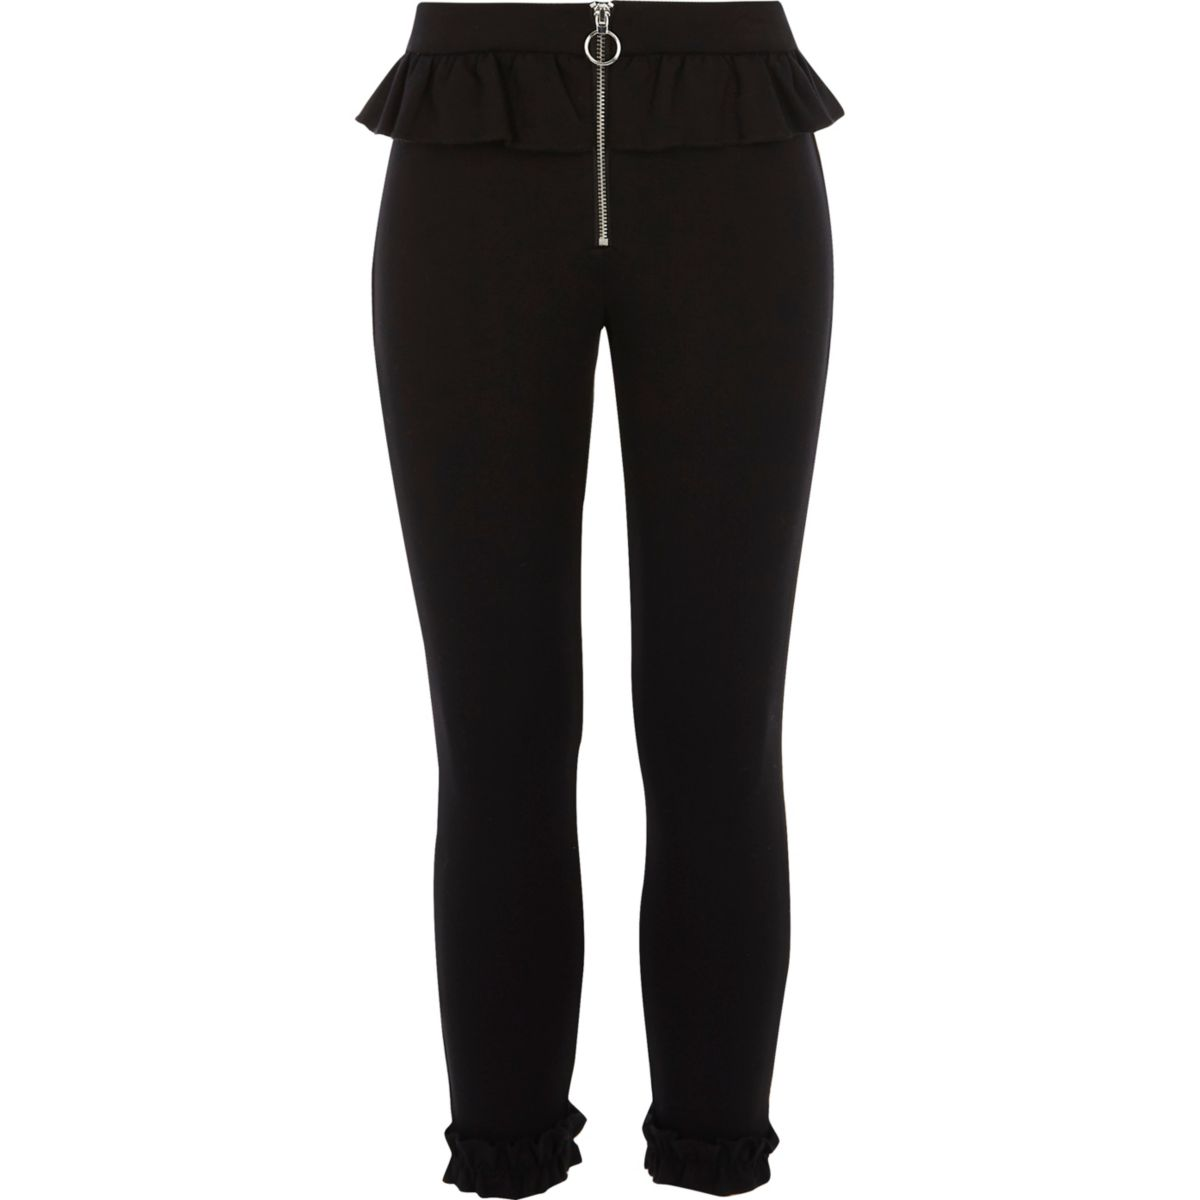 Girls black frill zip cigarette pants